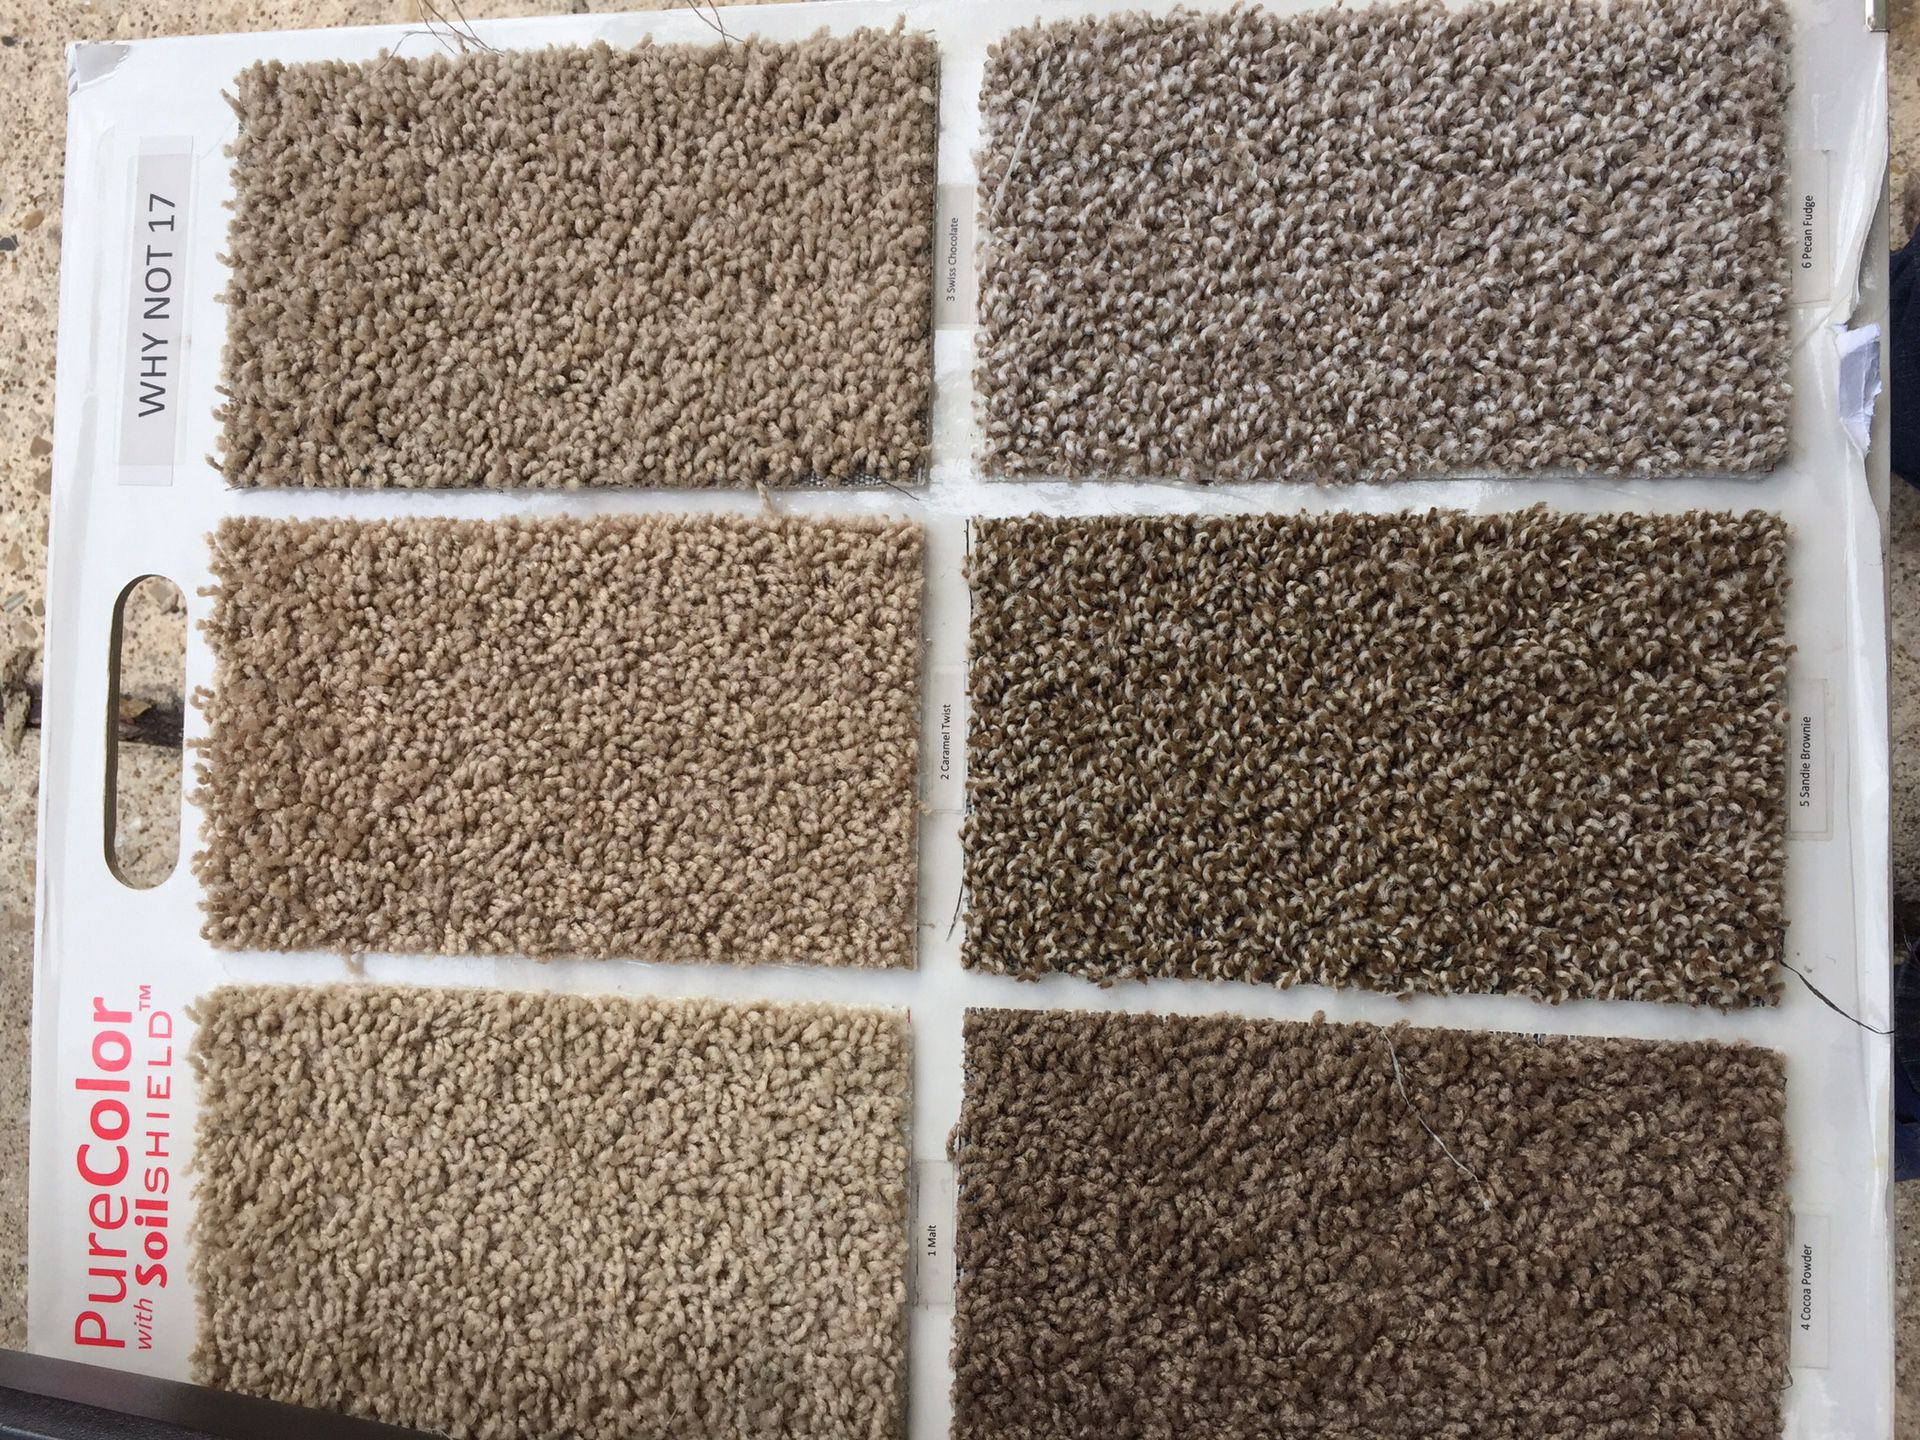 Carpet for sale 5.50 per yard minimum 100 yards